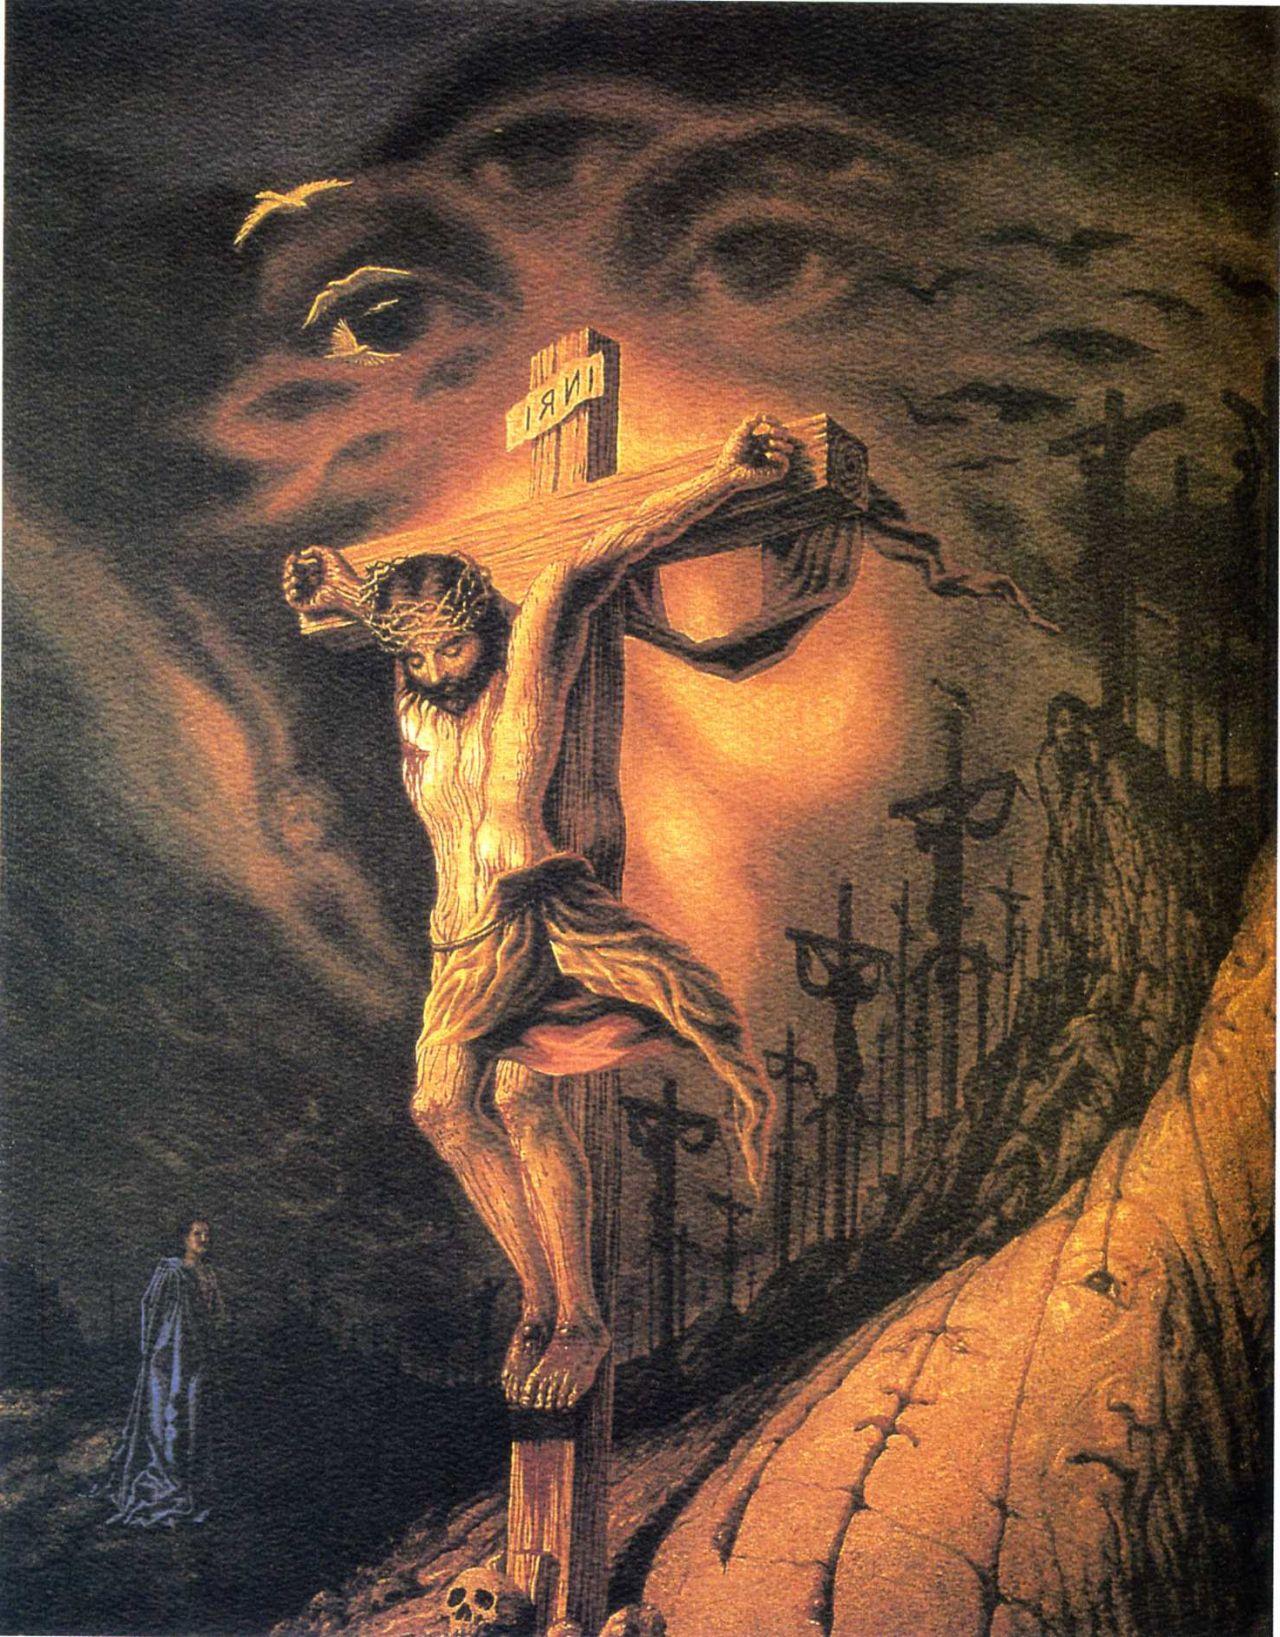 famous illusion optical illusions paintings inspirations graffiti